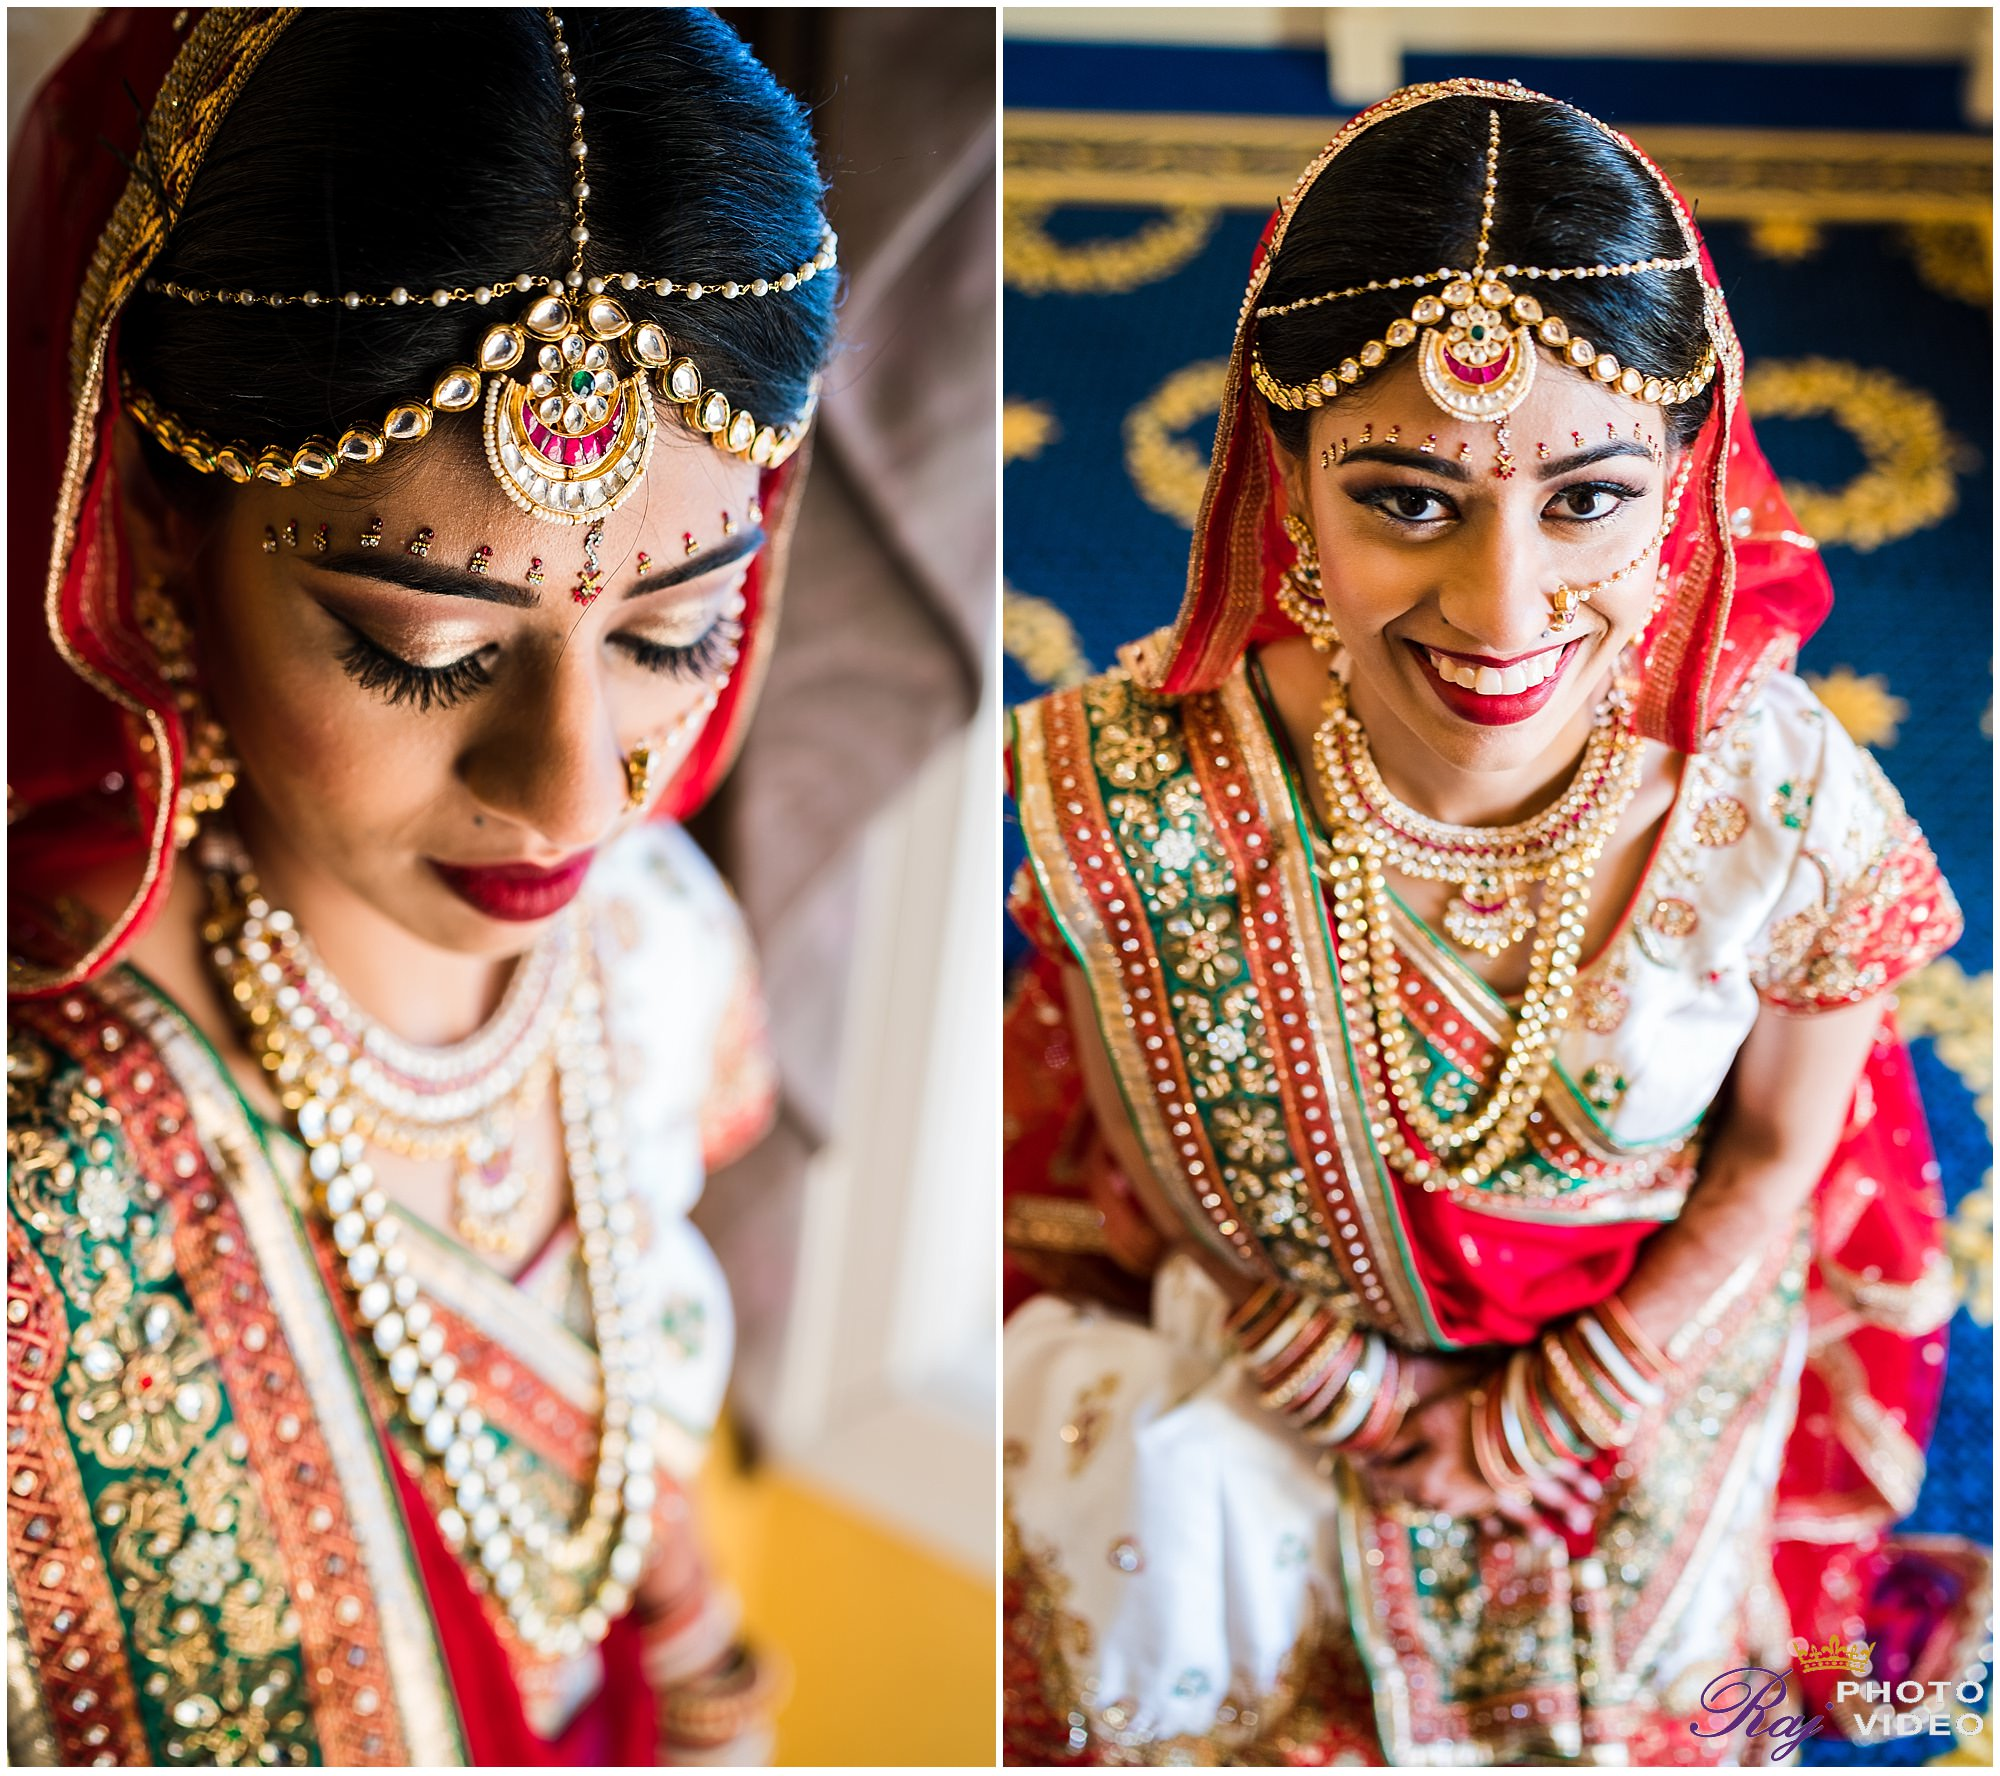 Founders-Inn-and-Spa-Virginia-Beach-VA-Indian-Wedding-Harini-Vivek-30.jpg